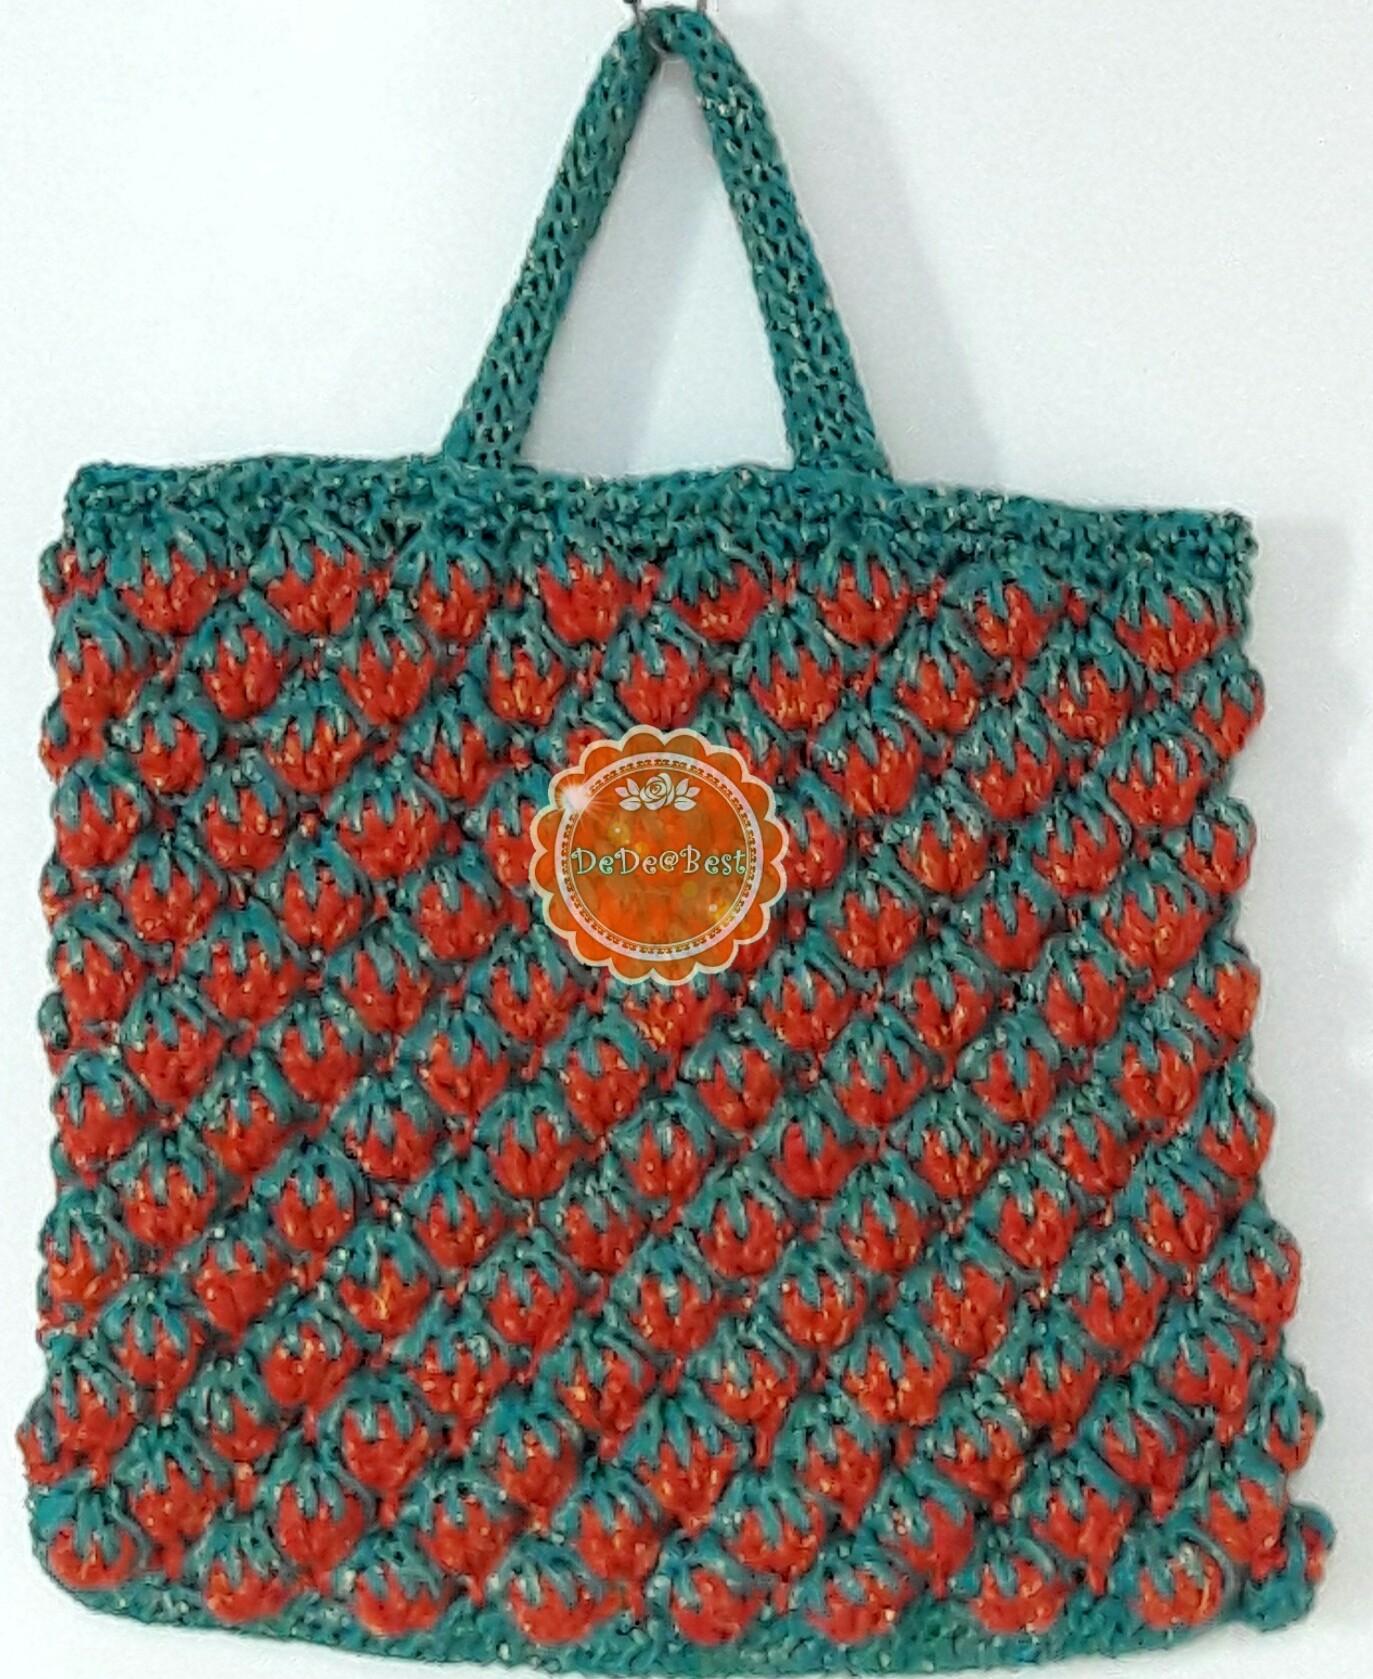 B68:Handmade bag กระเป๋าถักเชือกร่มดิ้นทอง สตอเบอรี่สีแดง+สีเขียว สินค้าใหม่ค่ะ